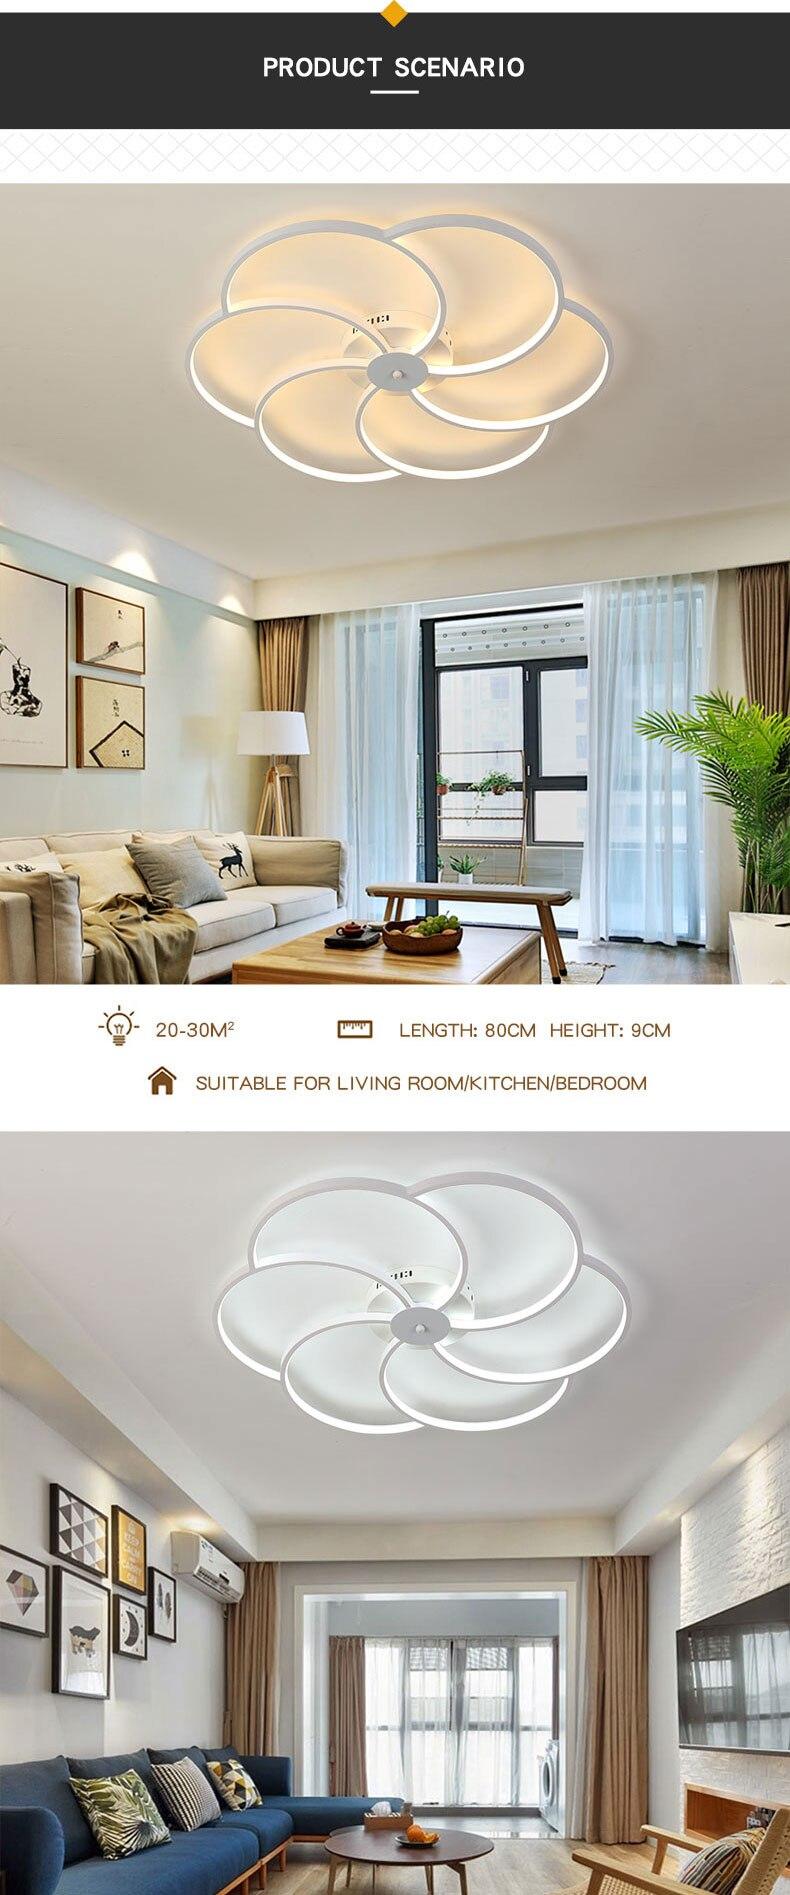 bedroom,kitchen ,living room, dining room,kid room